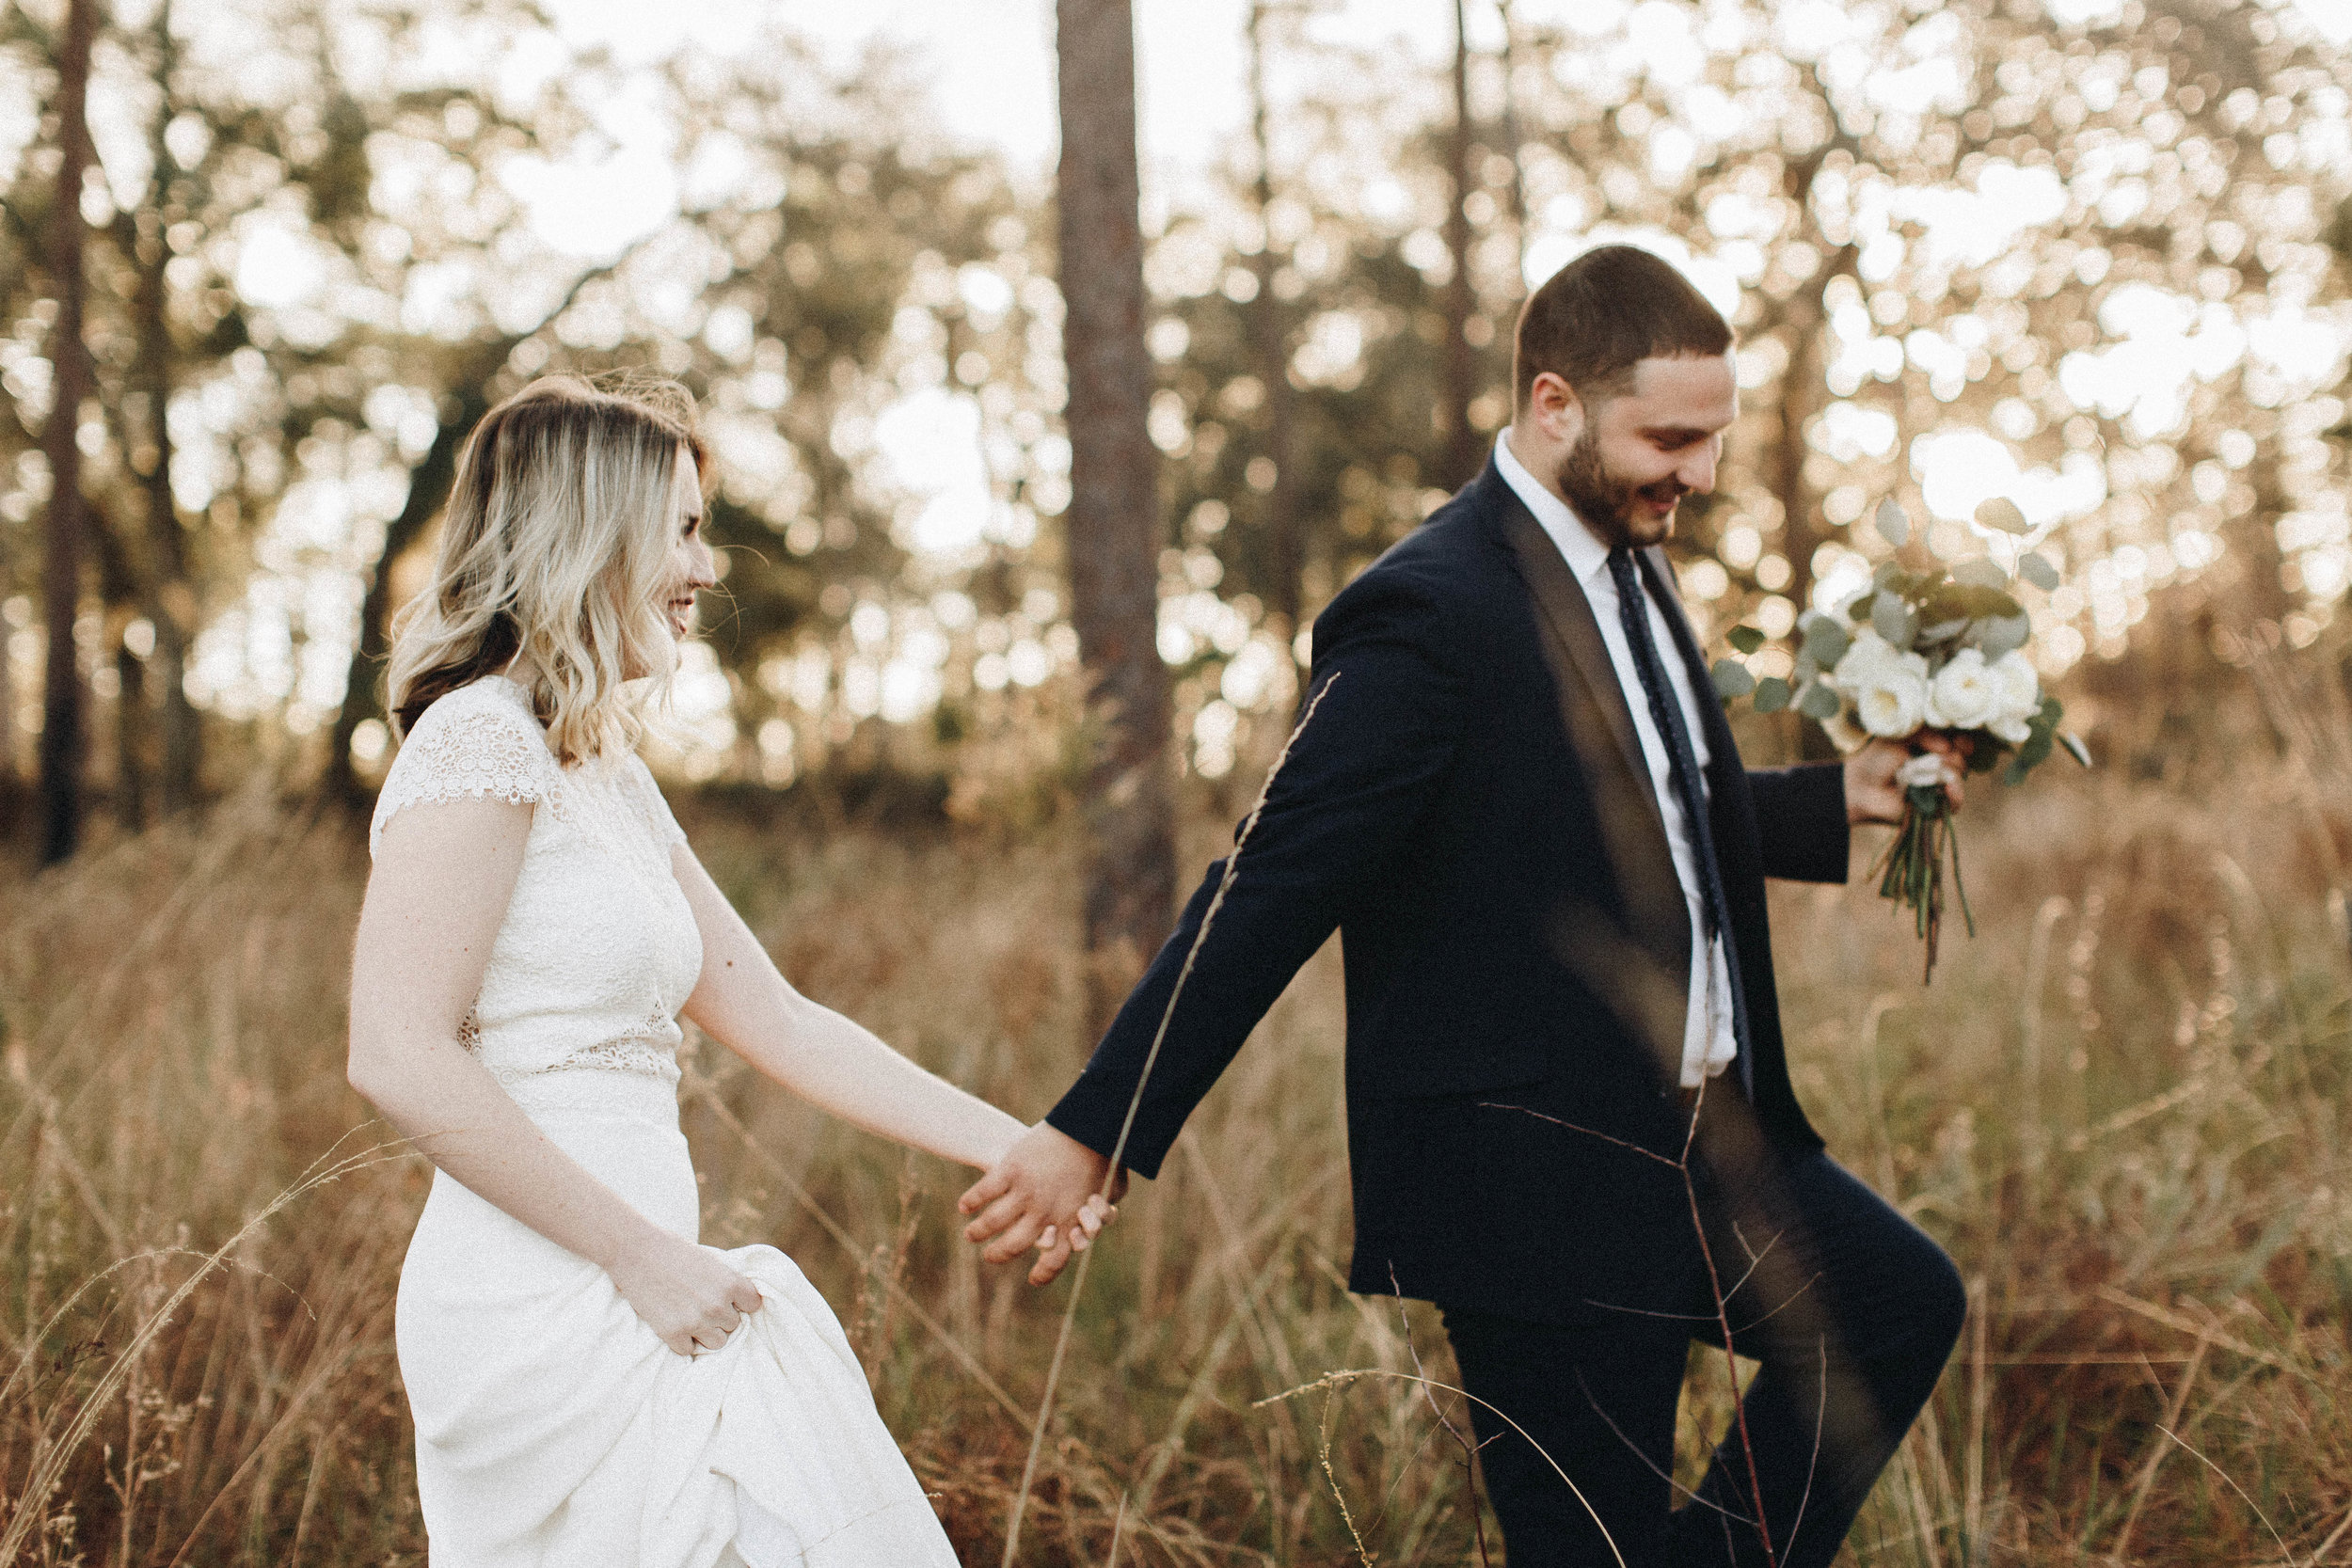 Orlando+wedding+photographer-17.jpeg